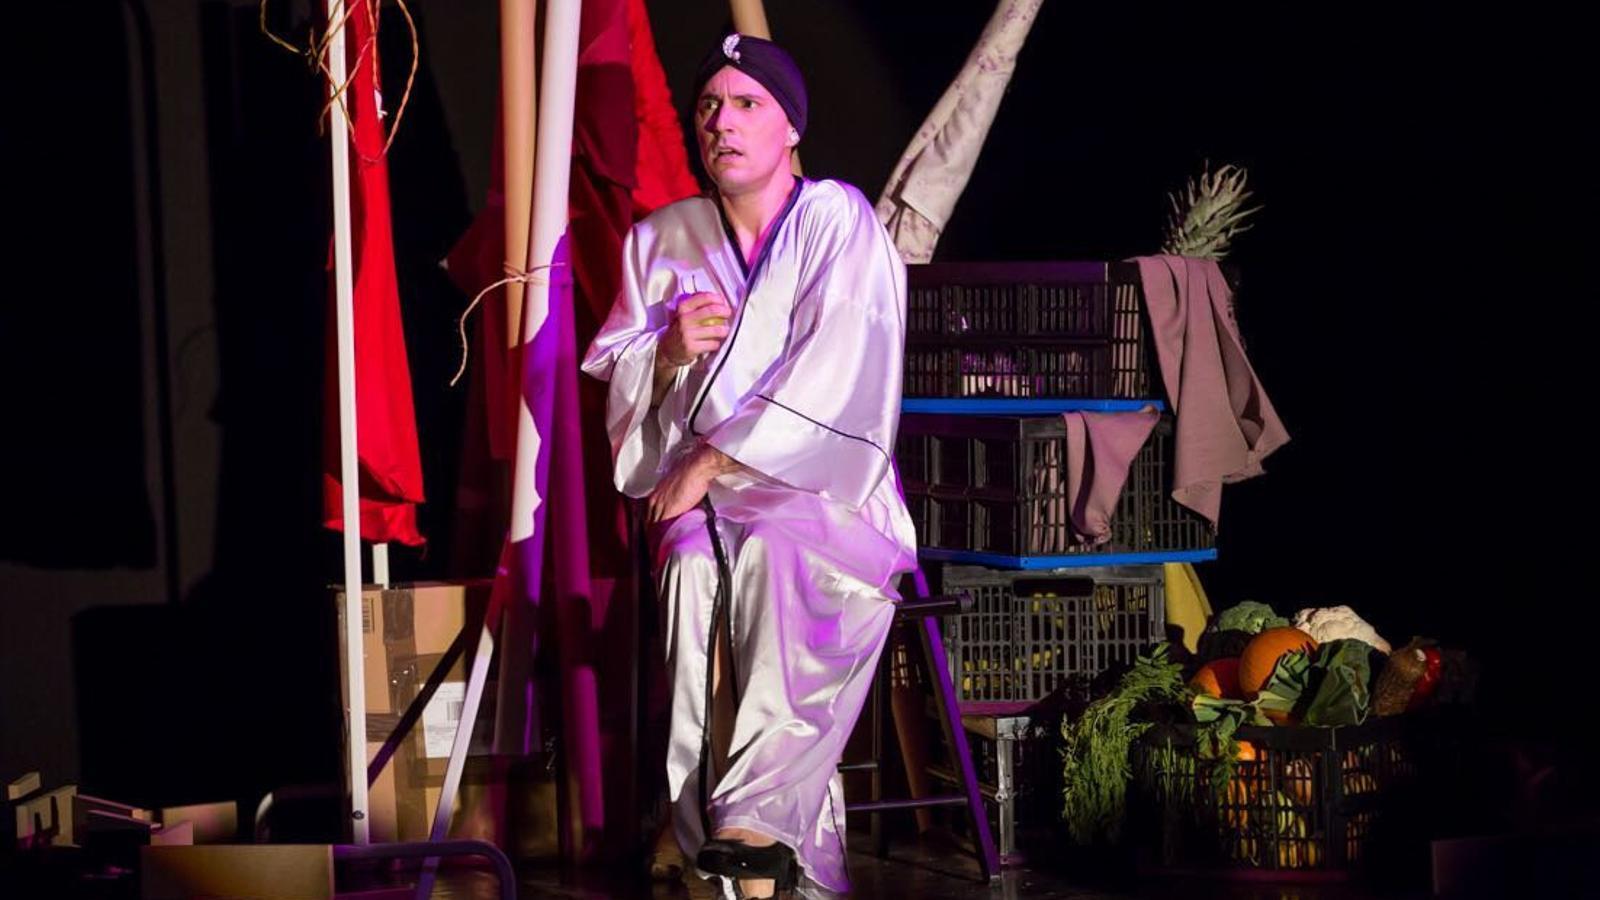 Espectacle de Kike Ayala al festival S'Illo de Santanyí.